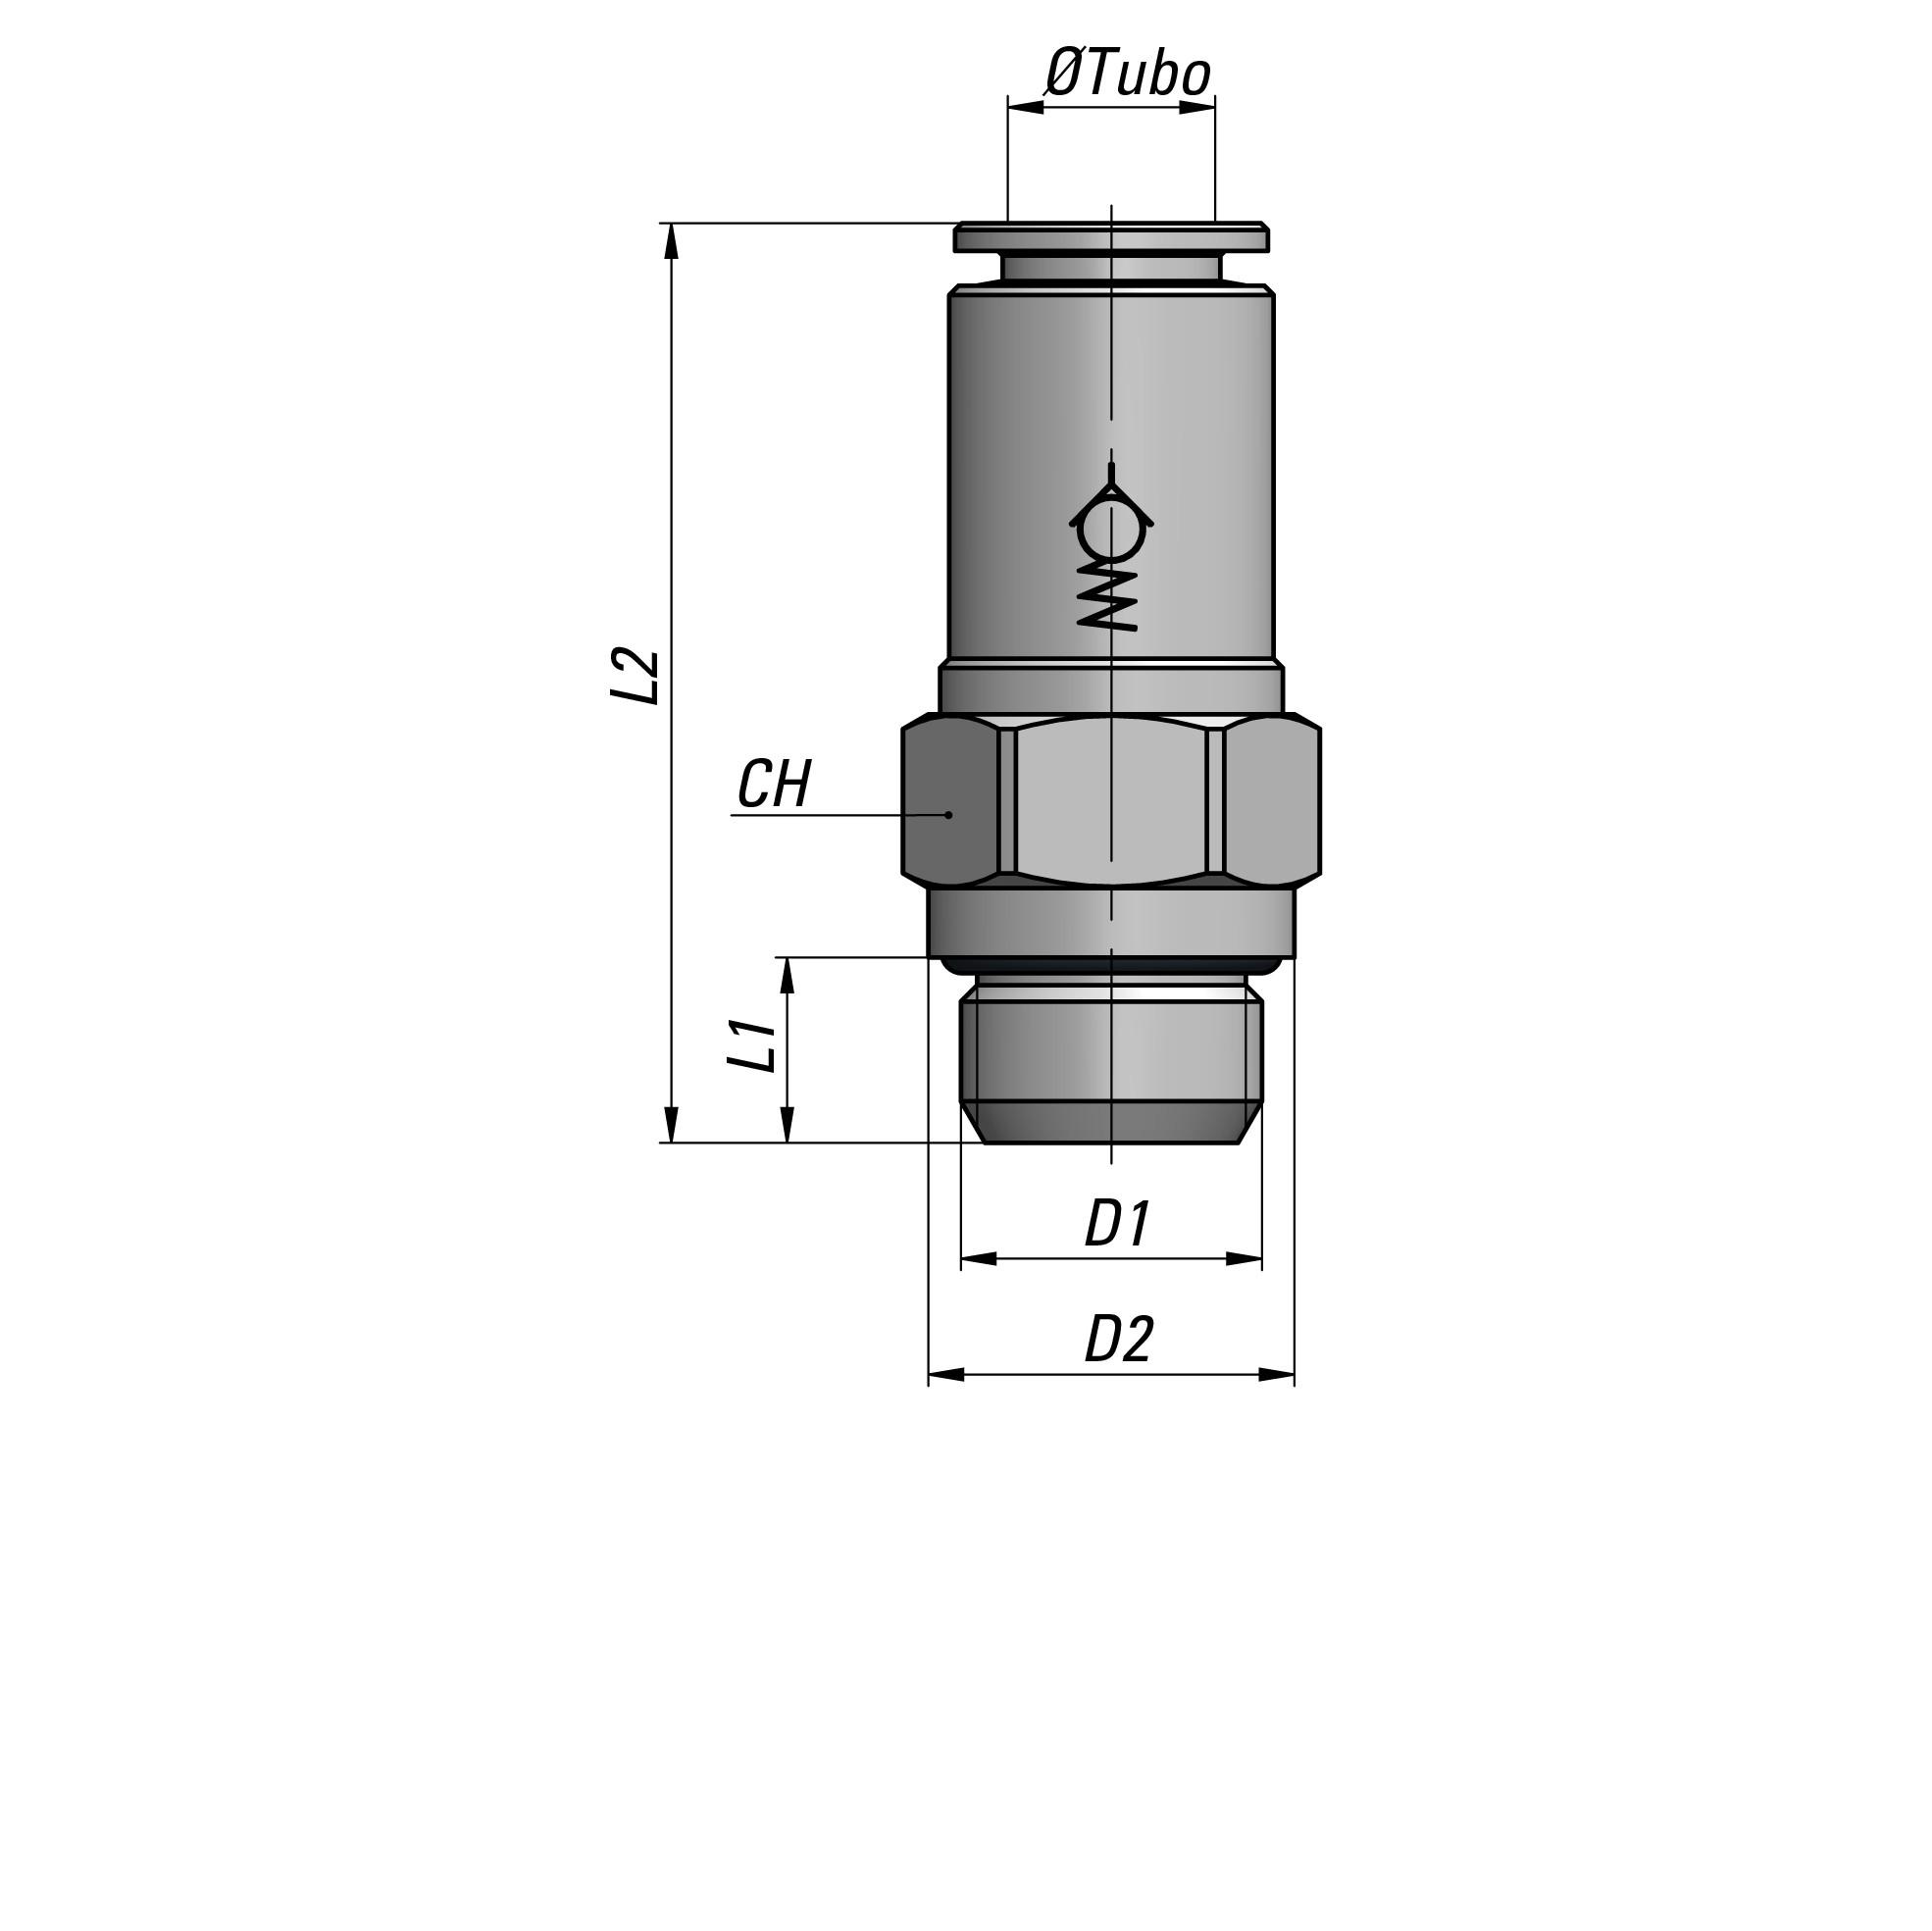 MV33 10 38